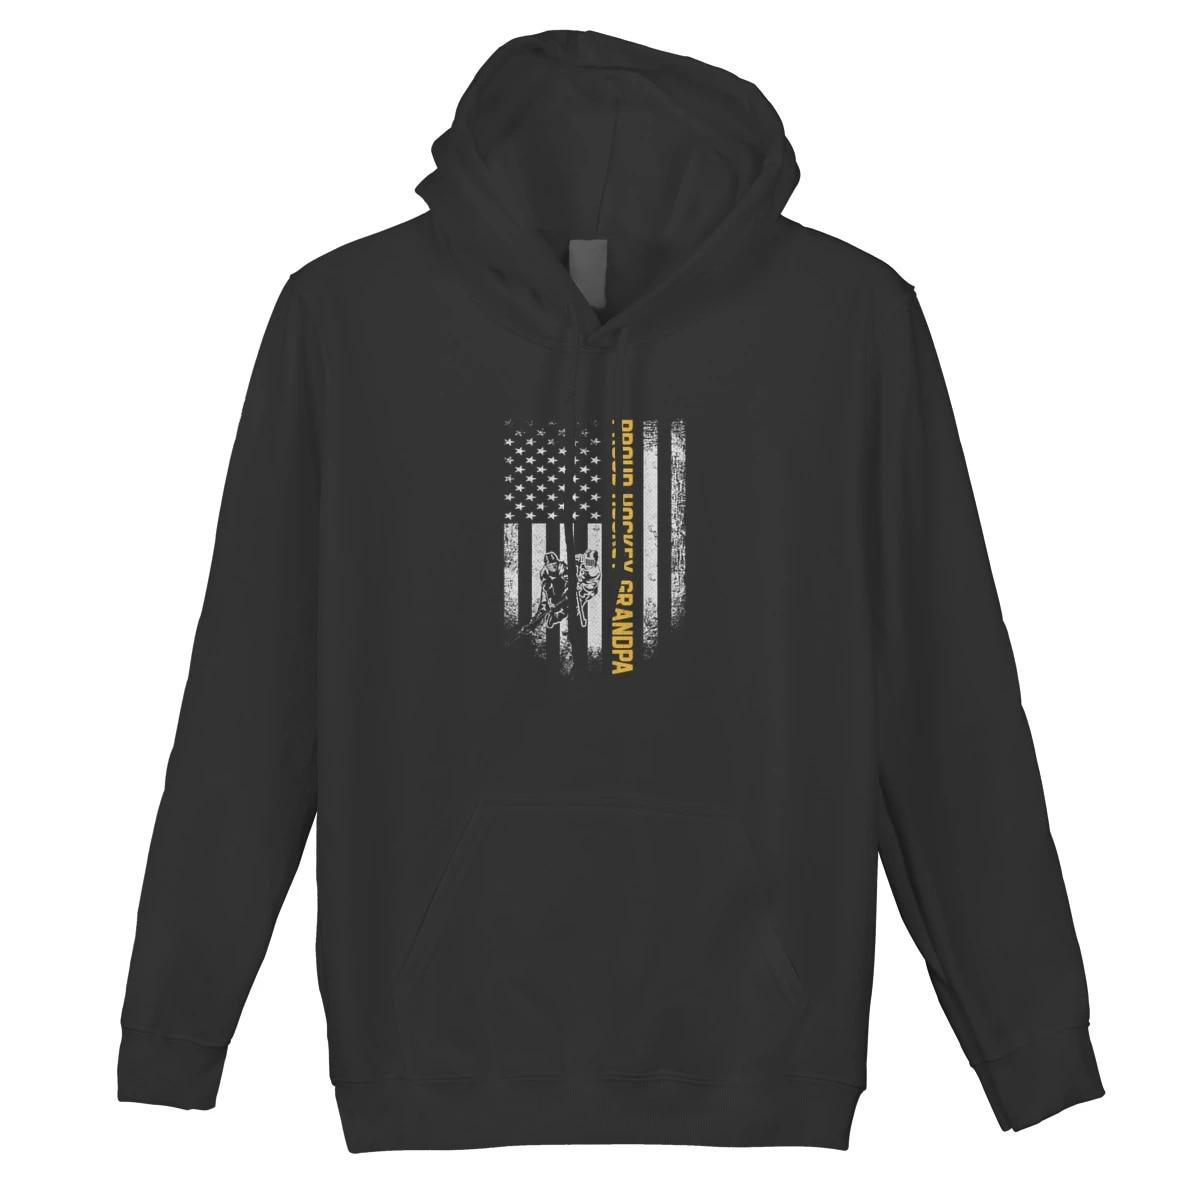 "ADULT HOCKEY grandpa custom gildan hooded sweatshirt /""HOCKEY grandpa HOODIE"